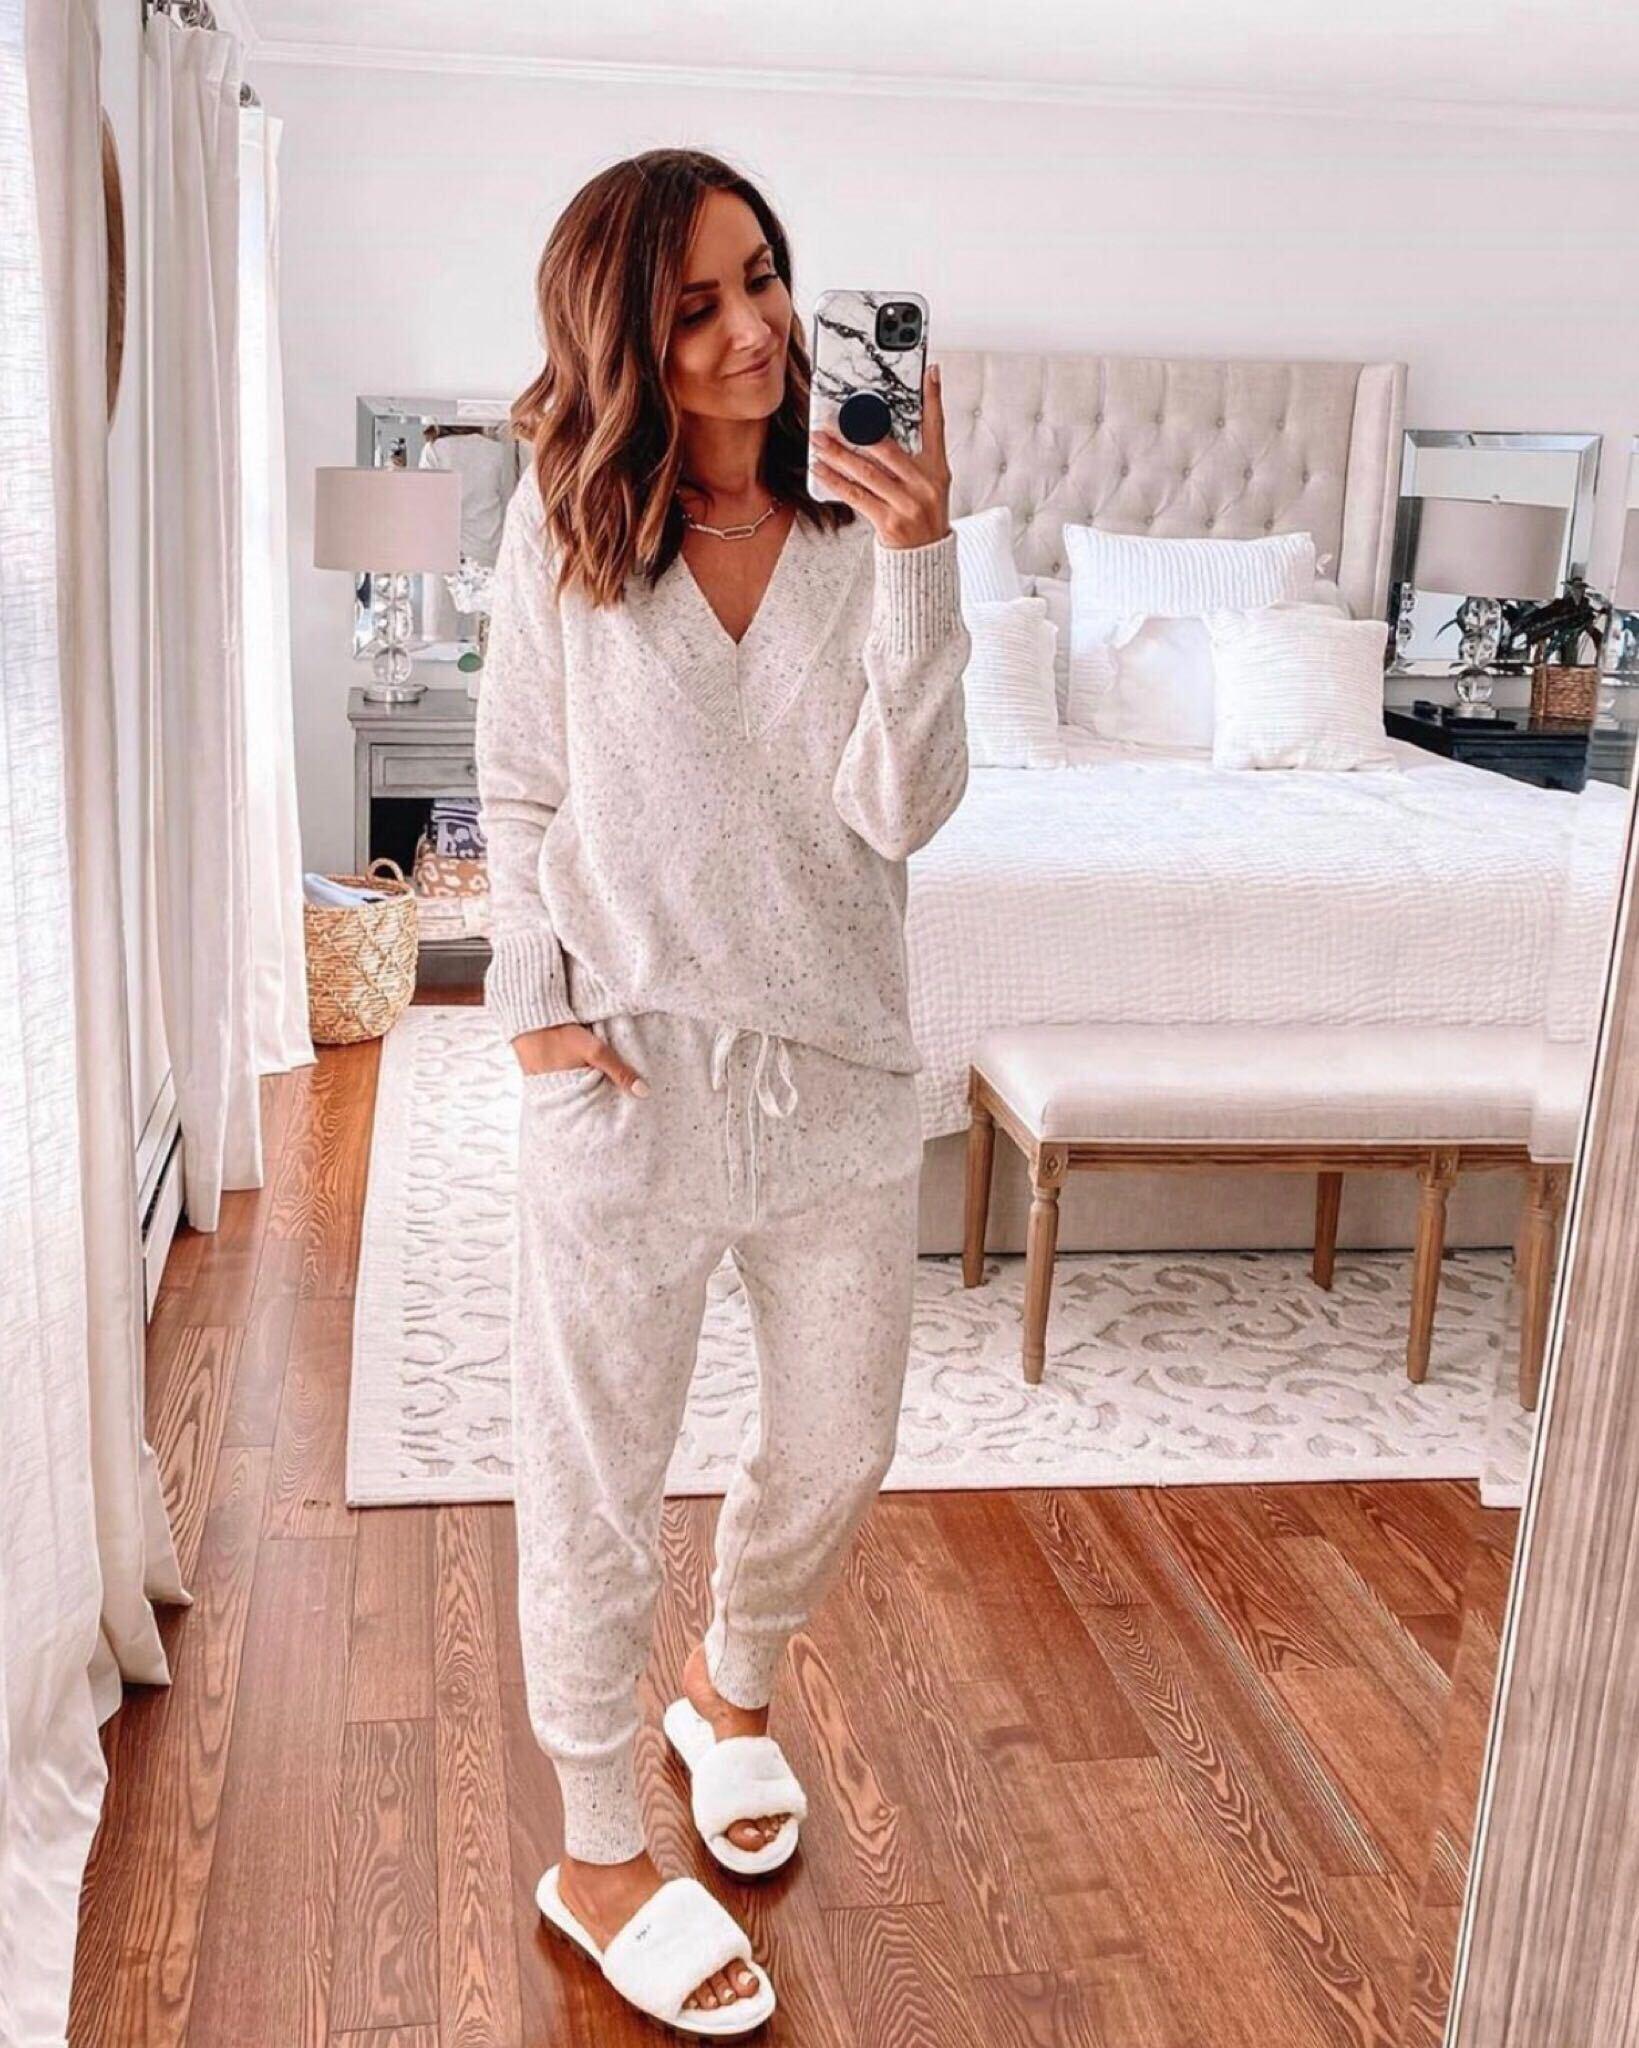 Sweater loungewear set, target finds